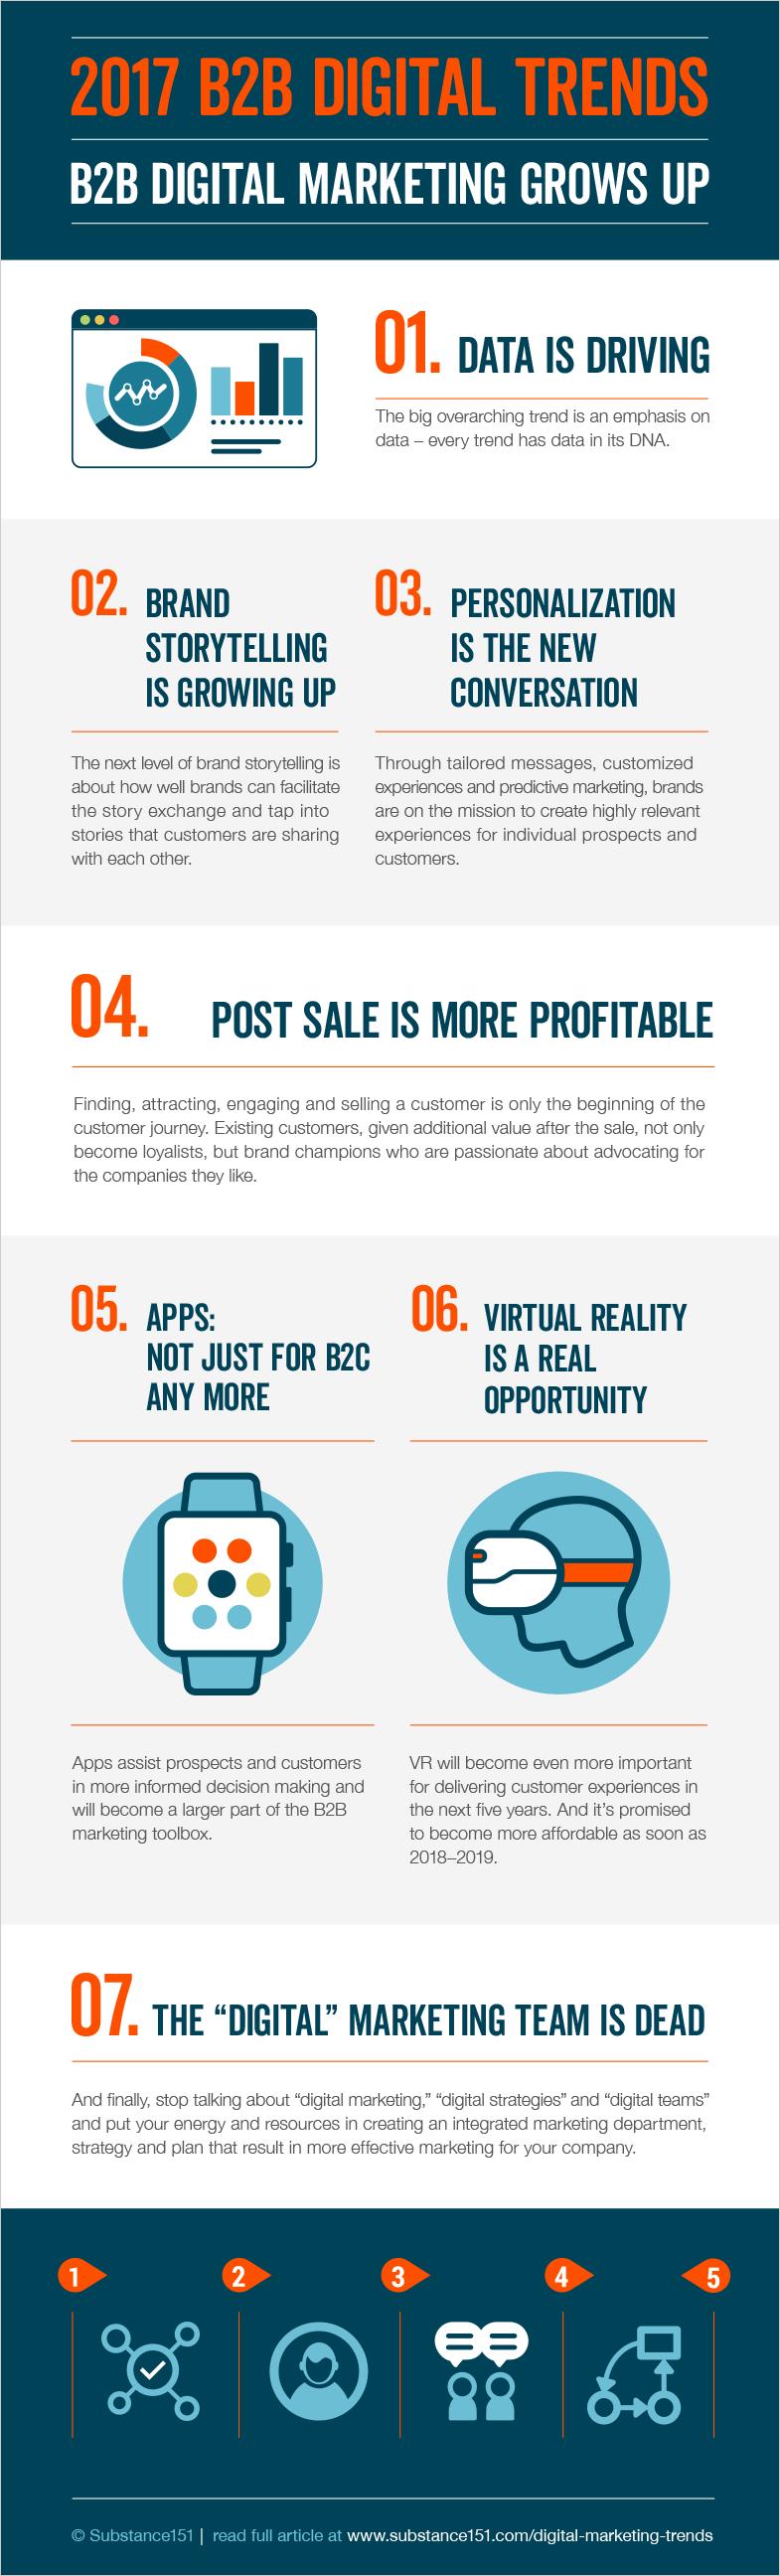 Creating a b2b digital marketing plan for 2017 infographic smart - 2017 B2b Digital Trends Infographic